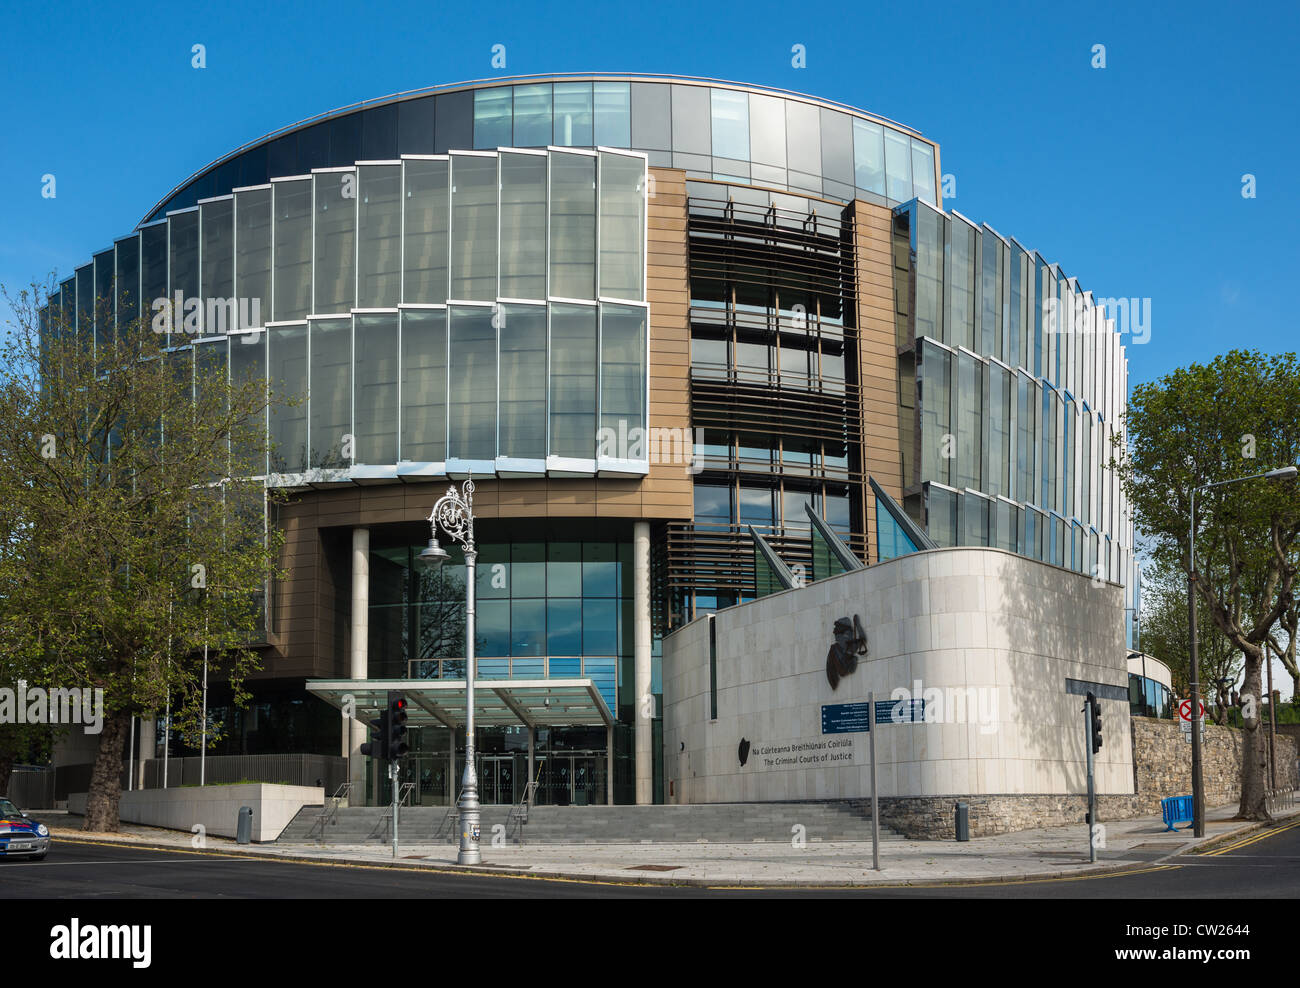 Criminal Courts of Justice, Dublin, Republic of Ireland. - Stock Image